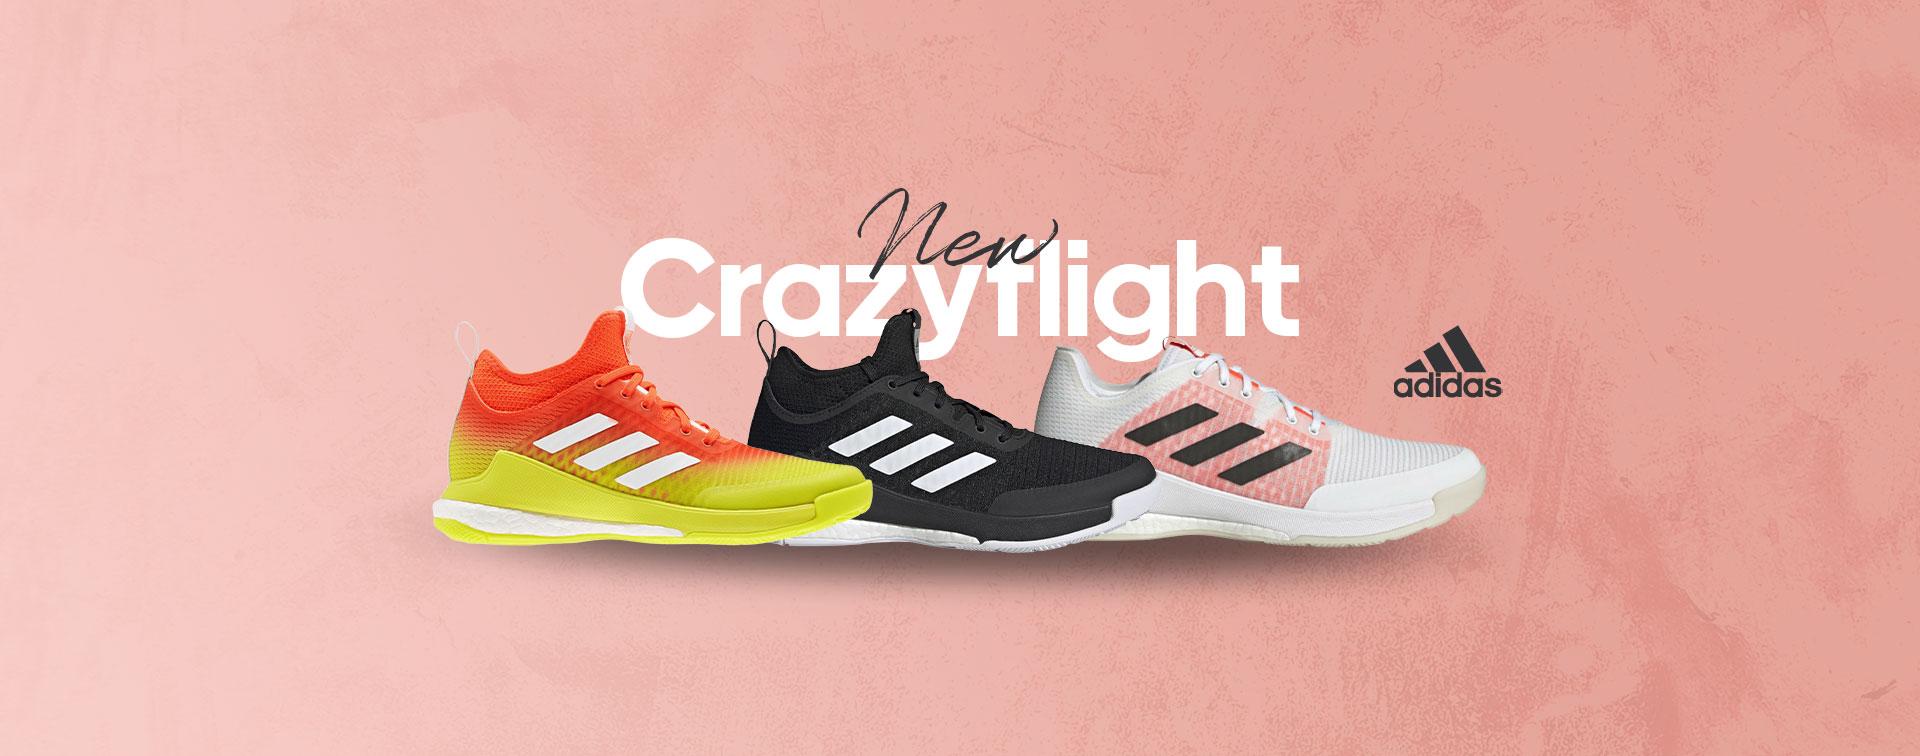 crazyflight adidas